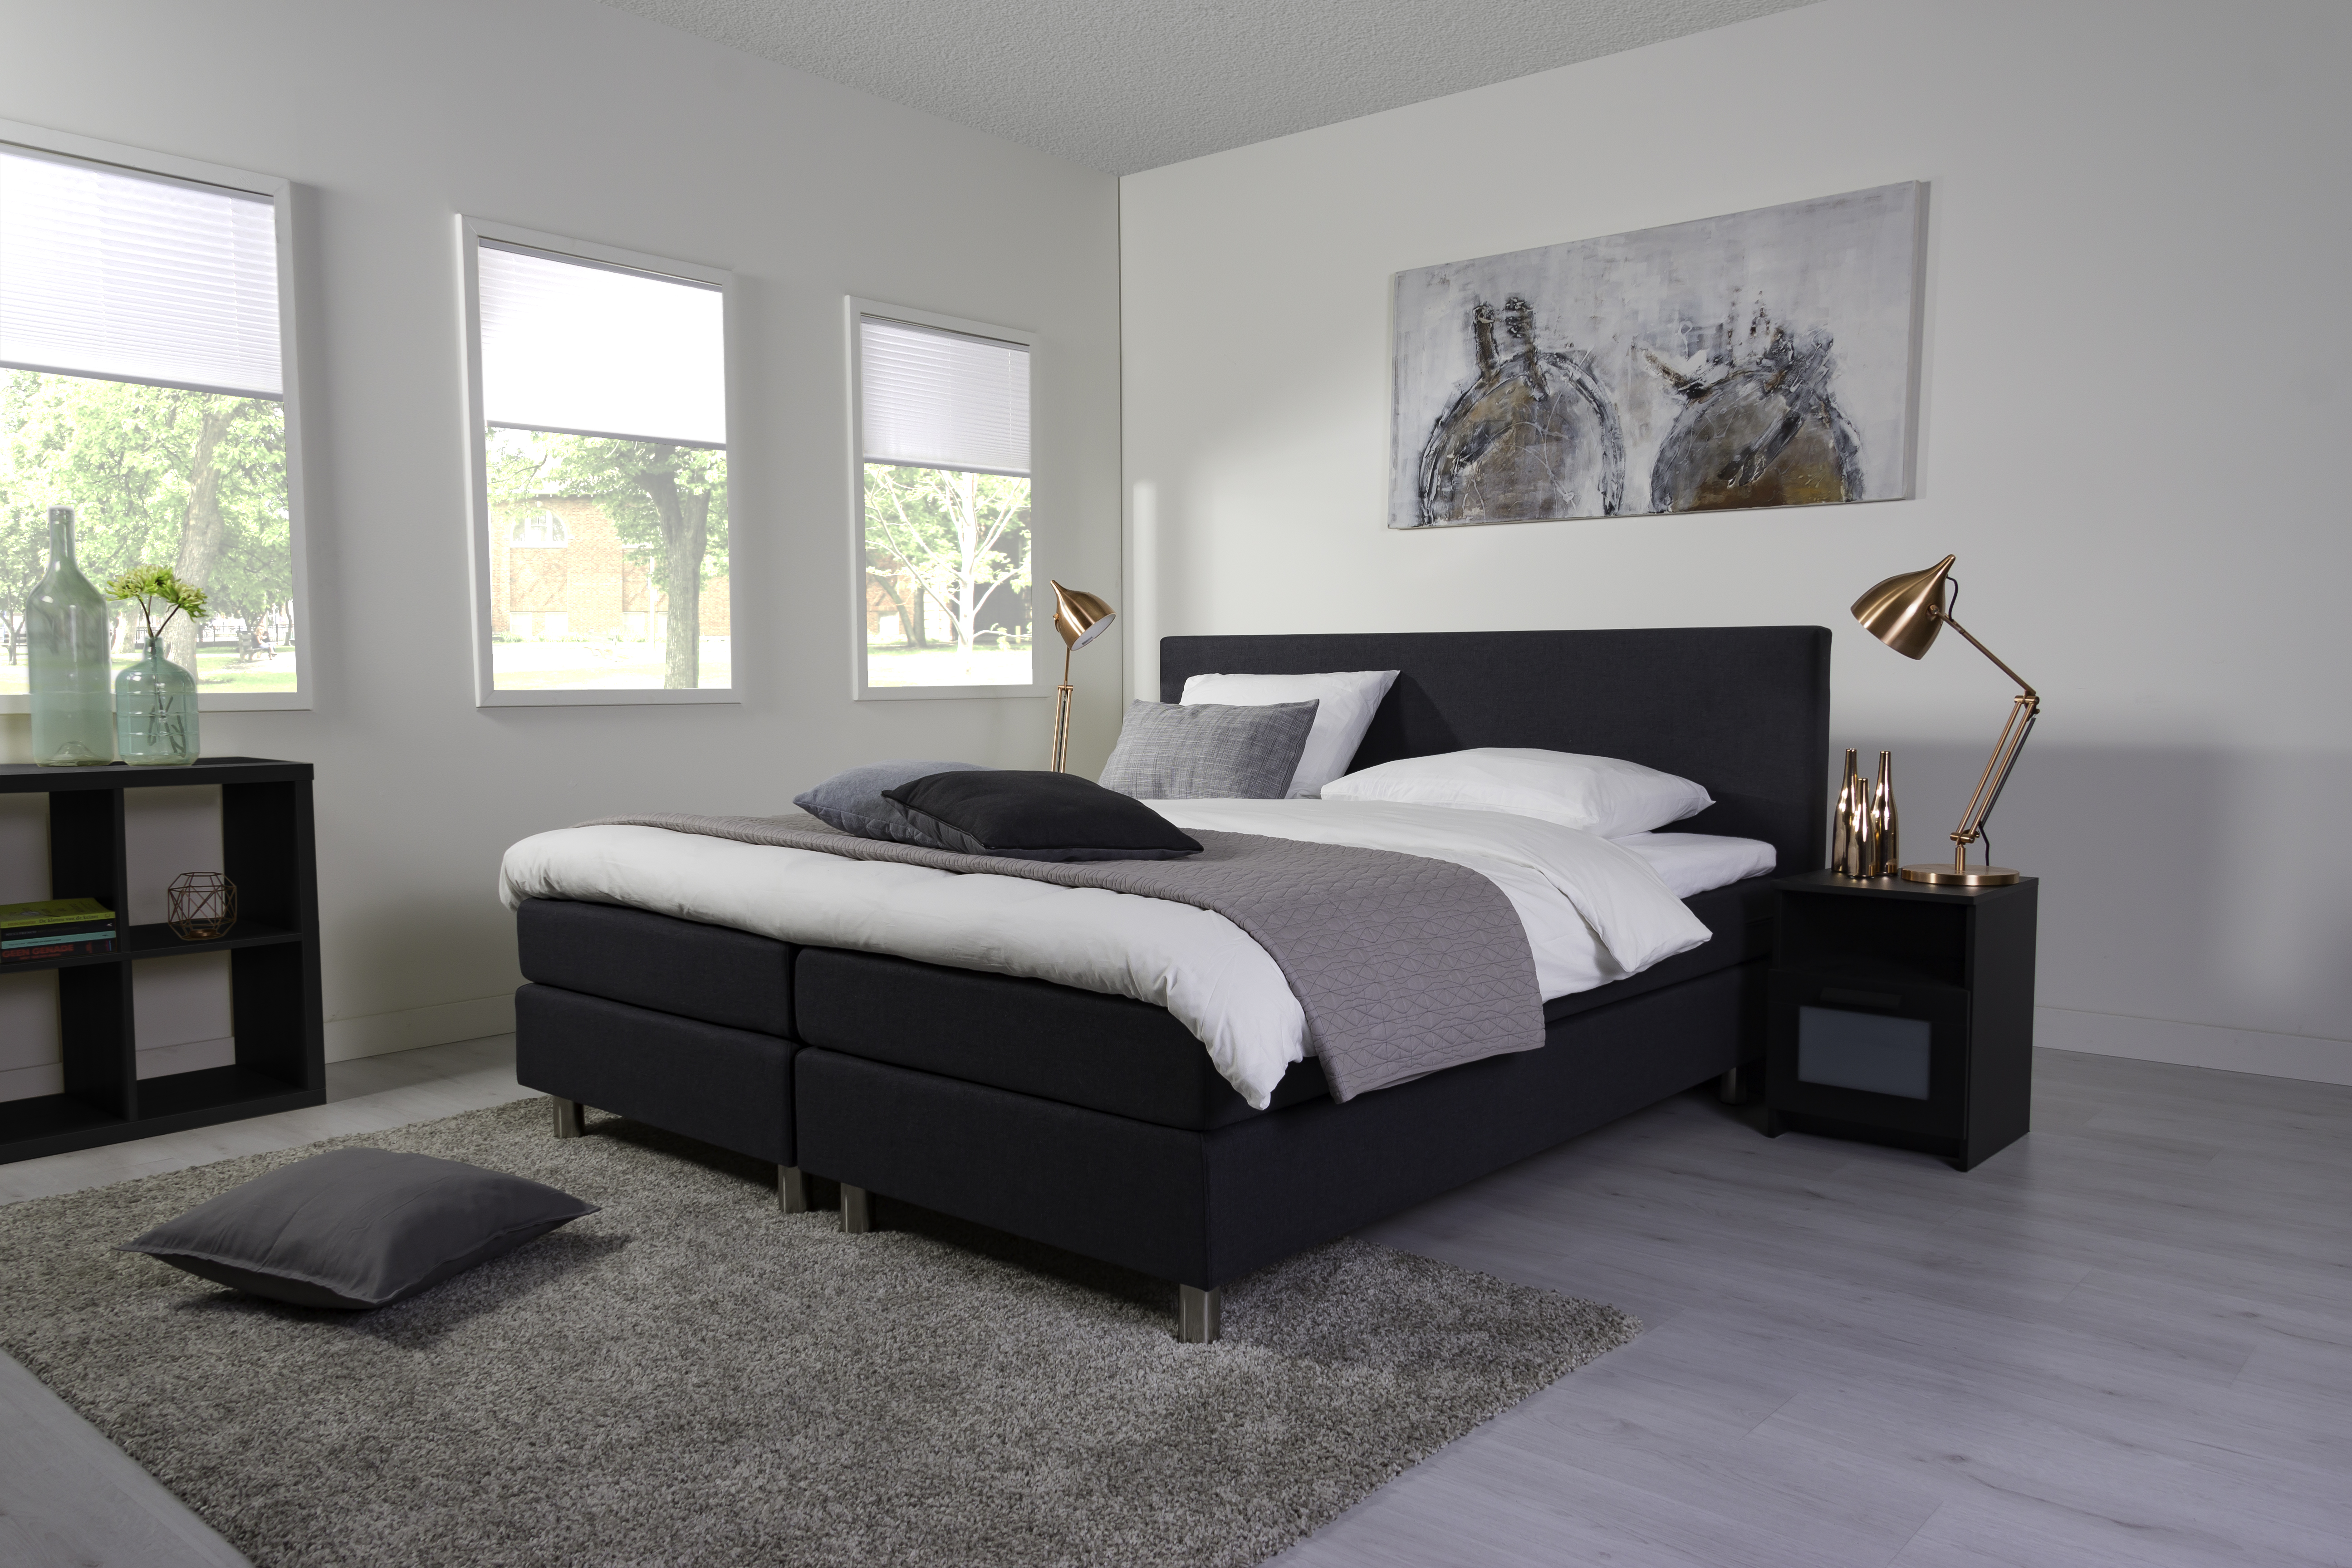 boxspringbett alpine farbe anthrazit elektrisch verstellbar ebay. Black Bedroom Furniture Sets. Home Design Ideas